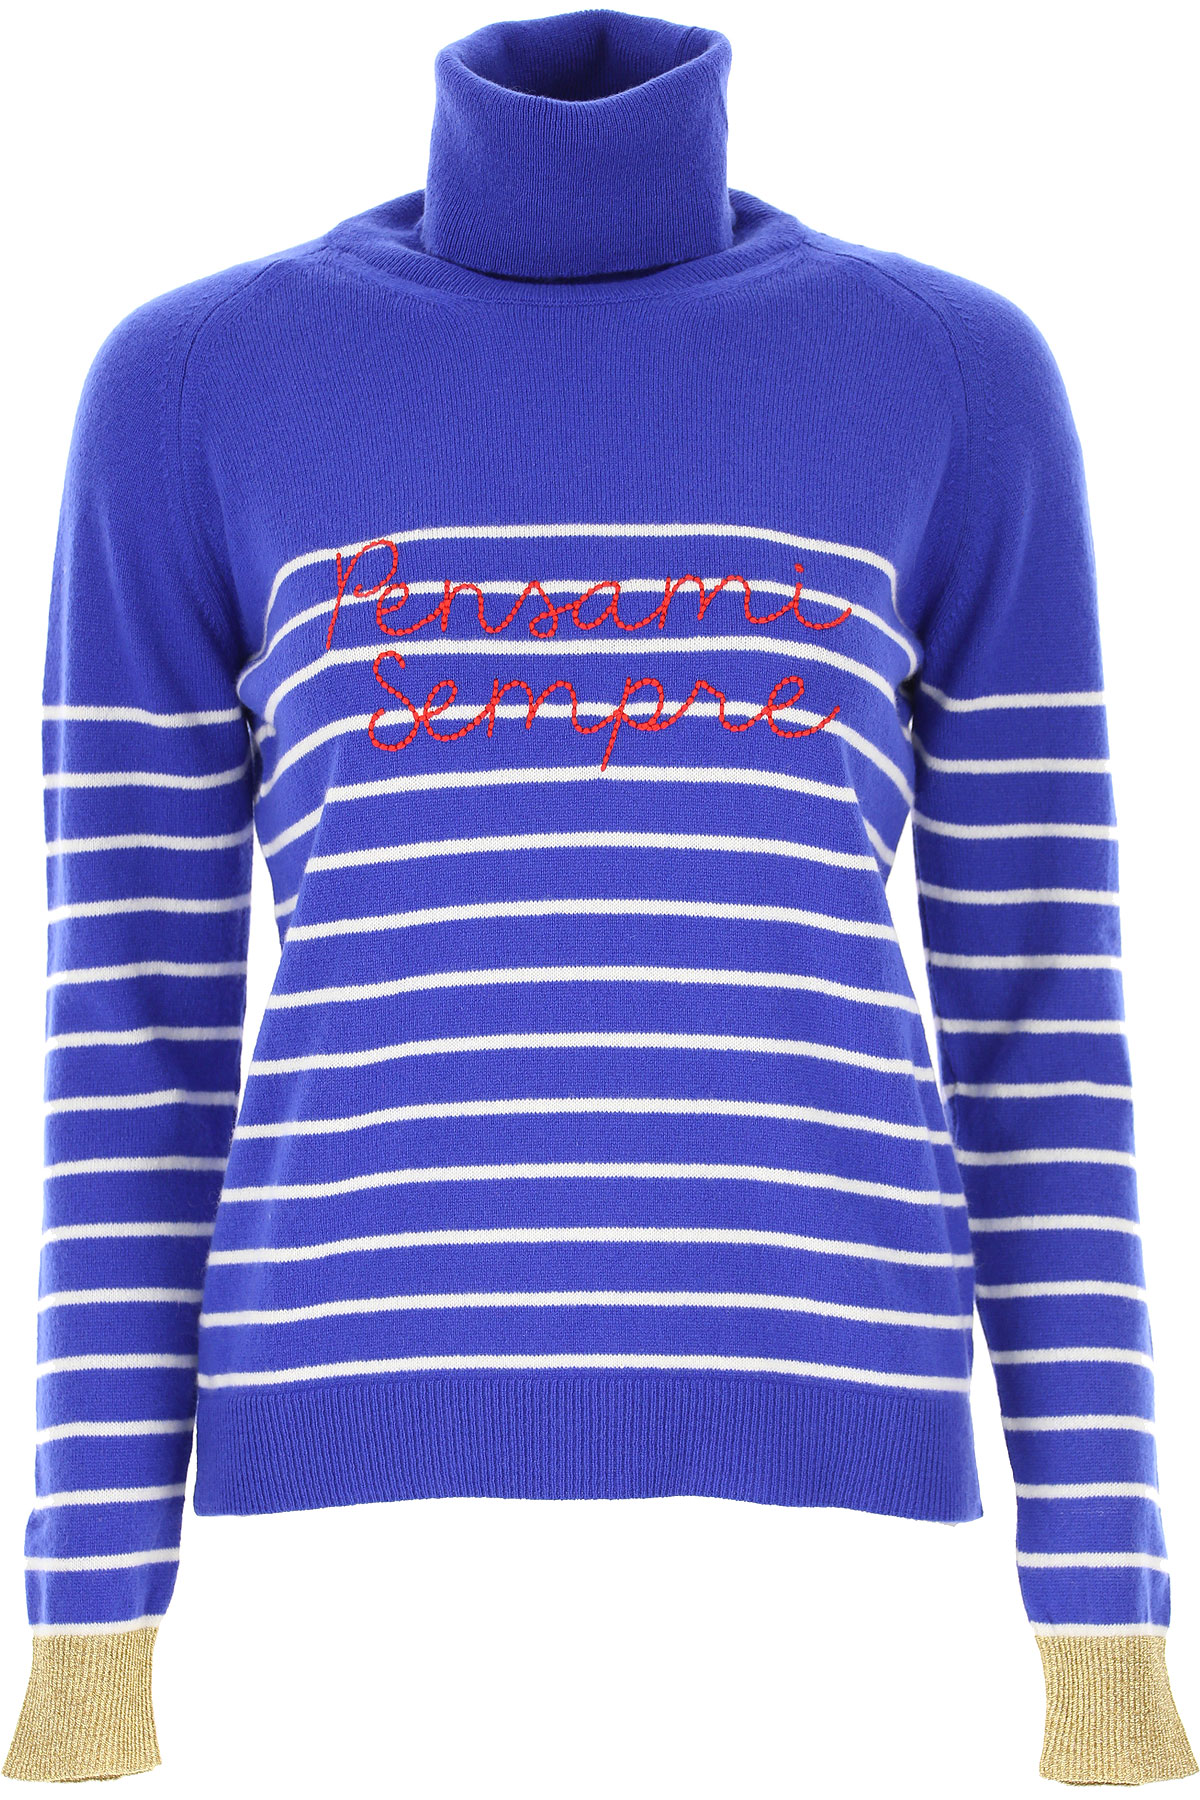 Giada Benincasa Sweater for Women Jumper On Sale, Electric Blue, Cashemere, 2019, 4 6 8